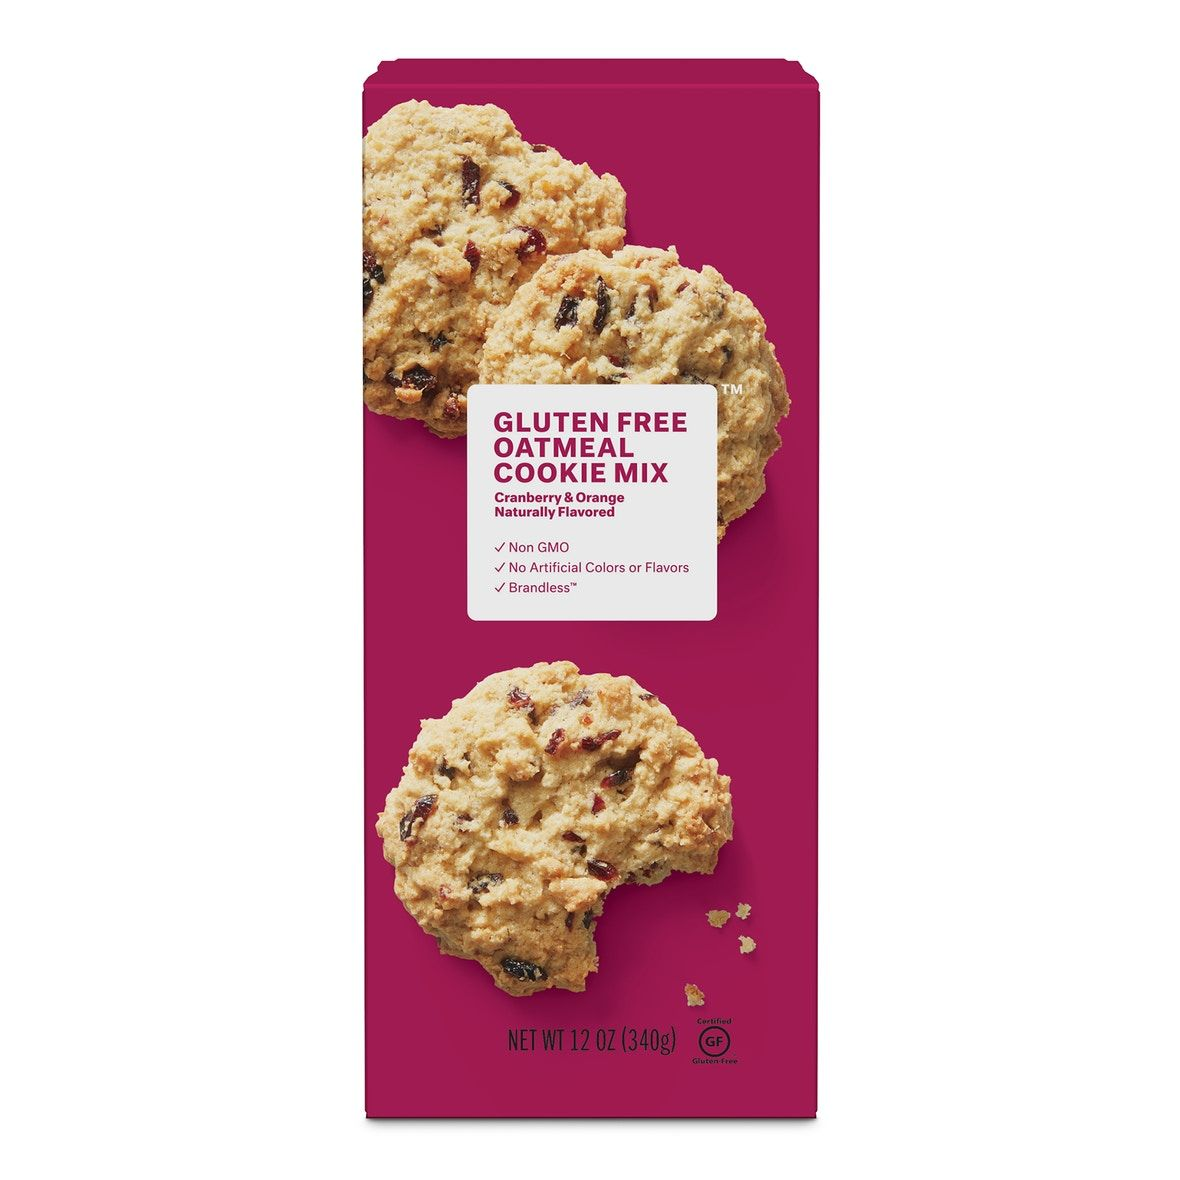 Gluten Free Cranberry Orange Oatmeal Cookie Mix 12 Oz